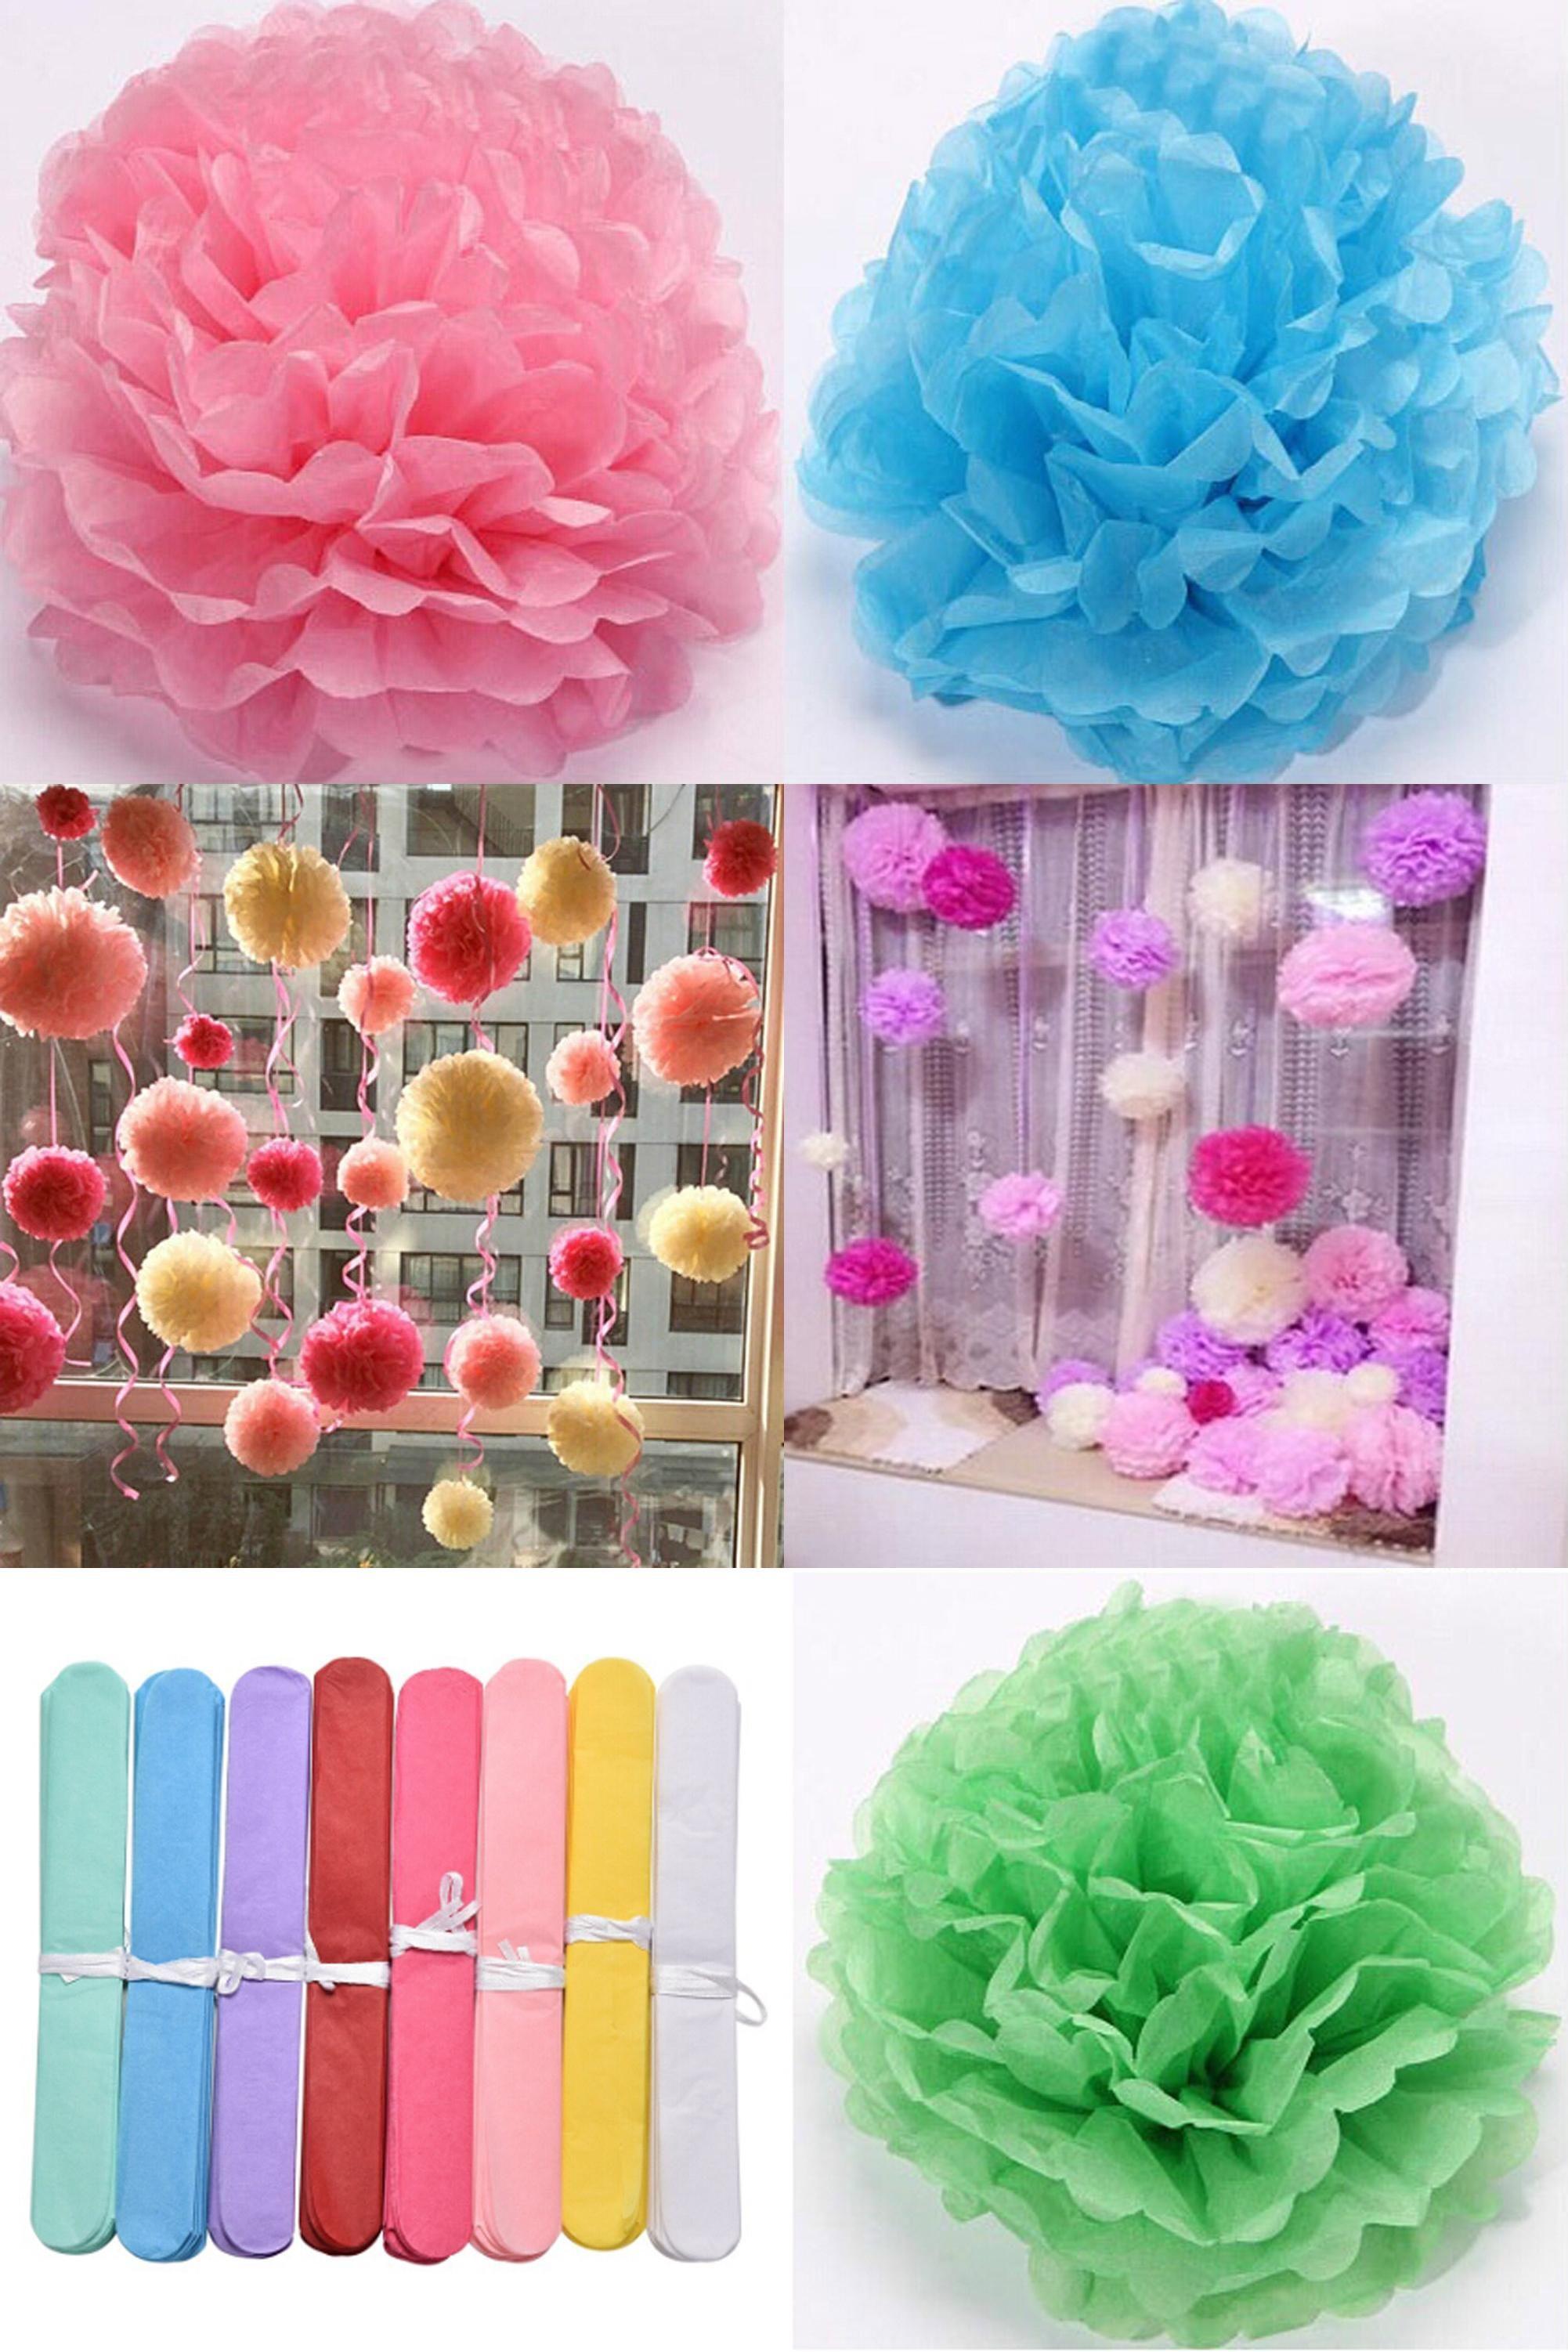 visit to buy 20cm paper flowers ball diy wedding birthday ornaments rh pinterest com